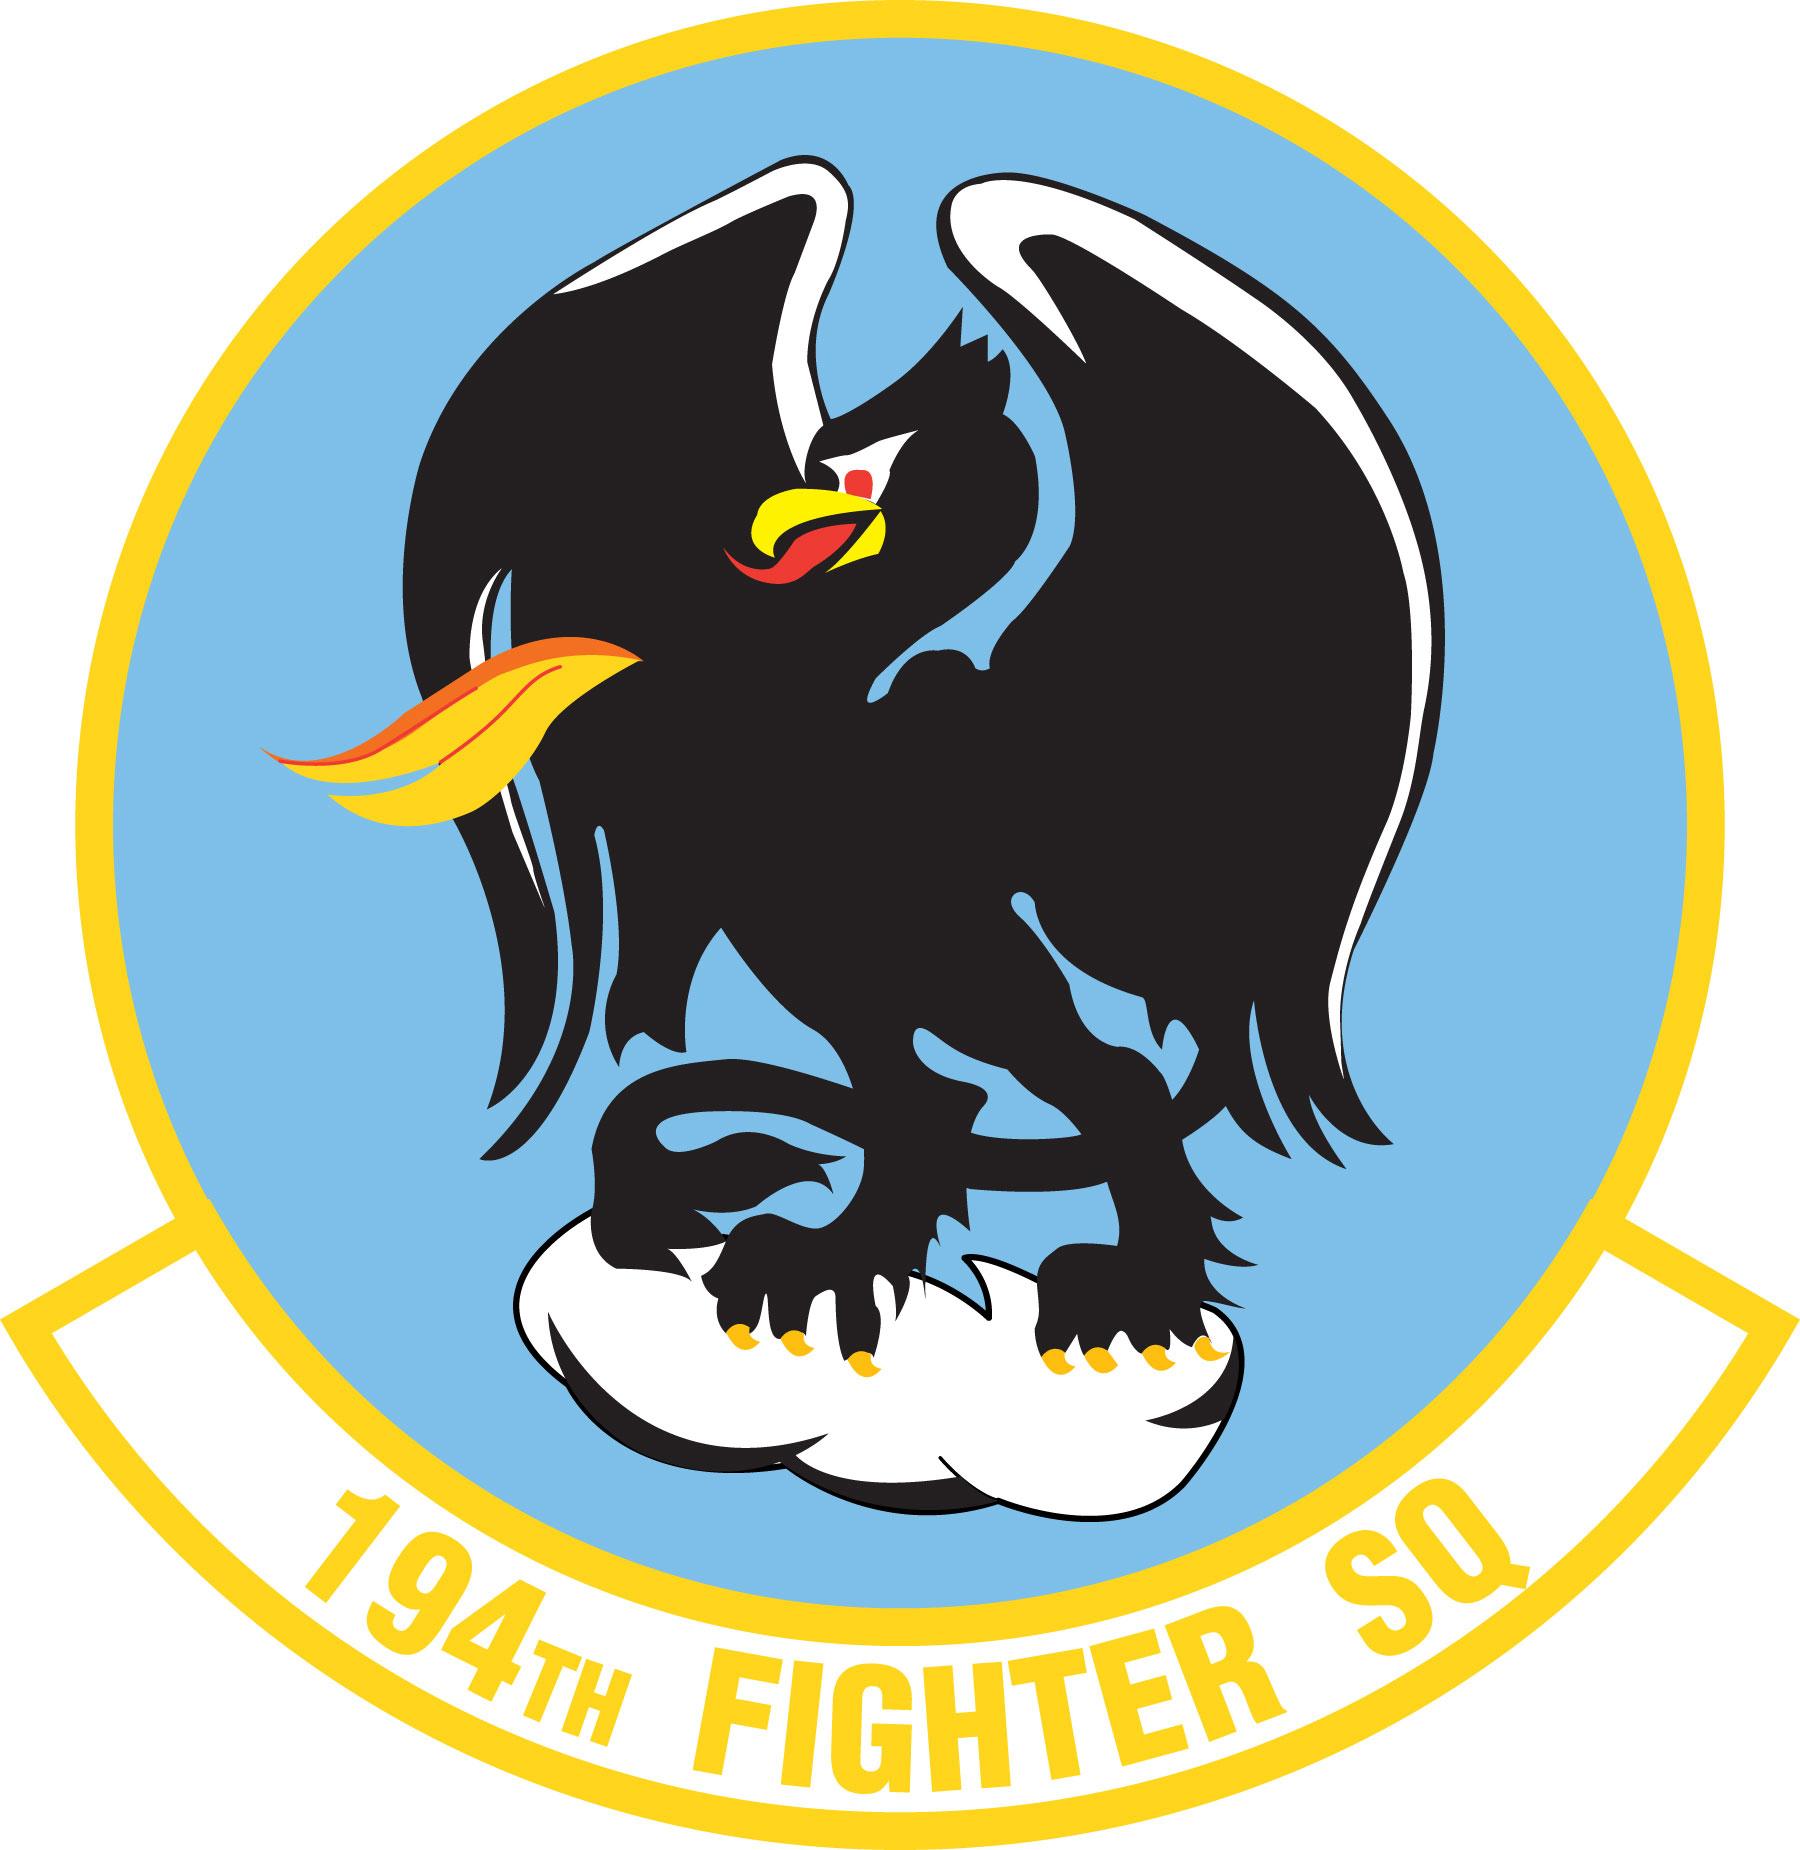 Fighter Squadron Logos 194th Fighter Squadron